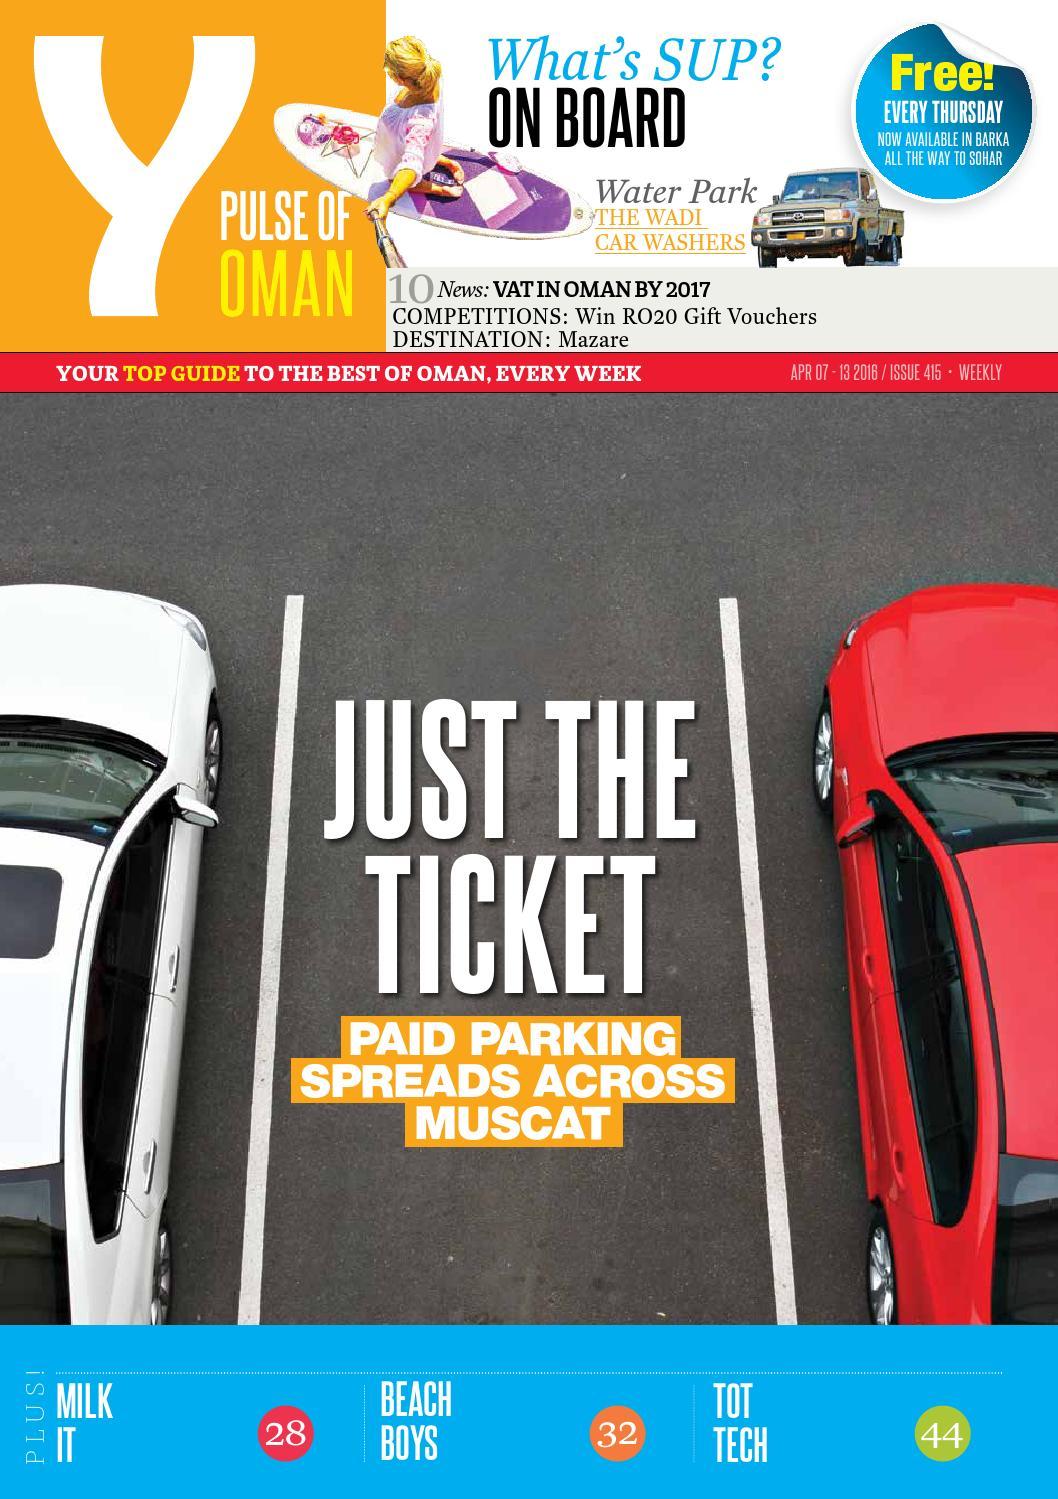 Y Magazine #415, April 7, 2016 by SABCO Press, Publishing